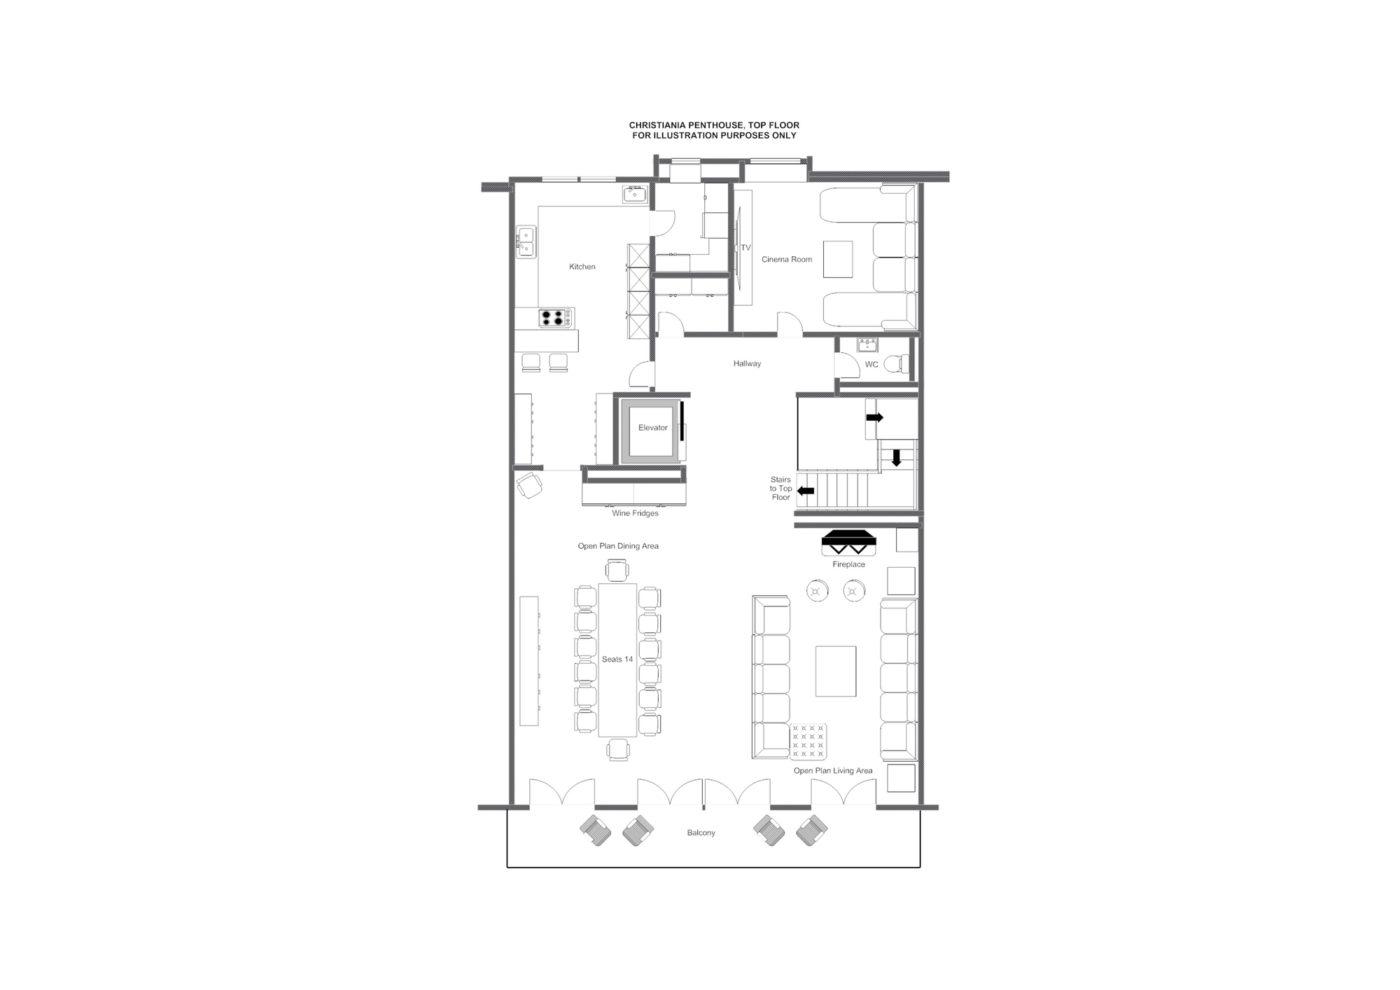 Christiania Penthouse Zermatt Floor Plan 1